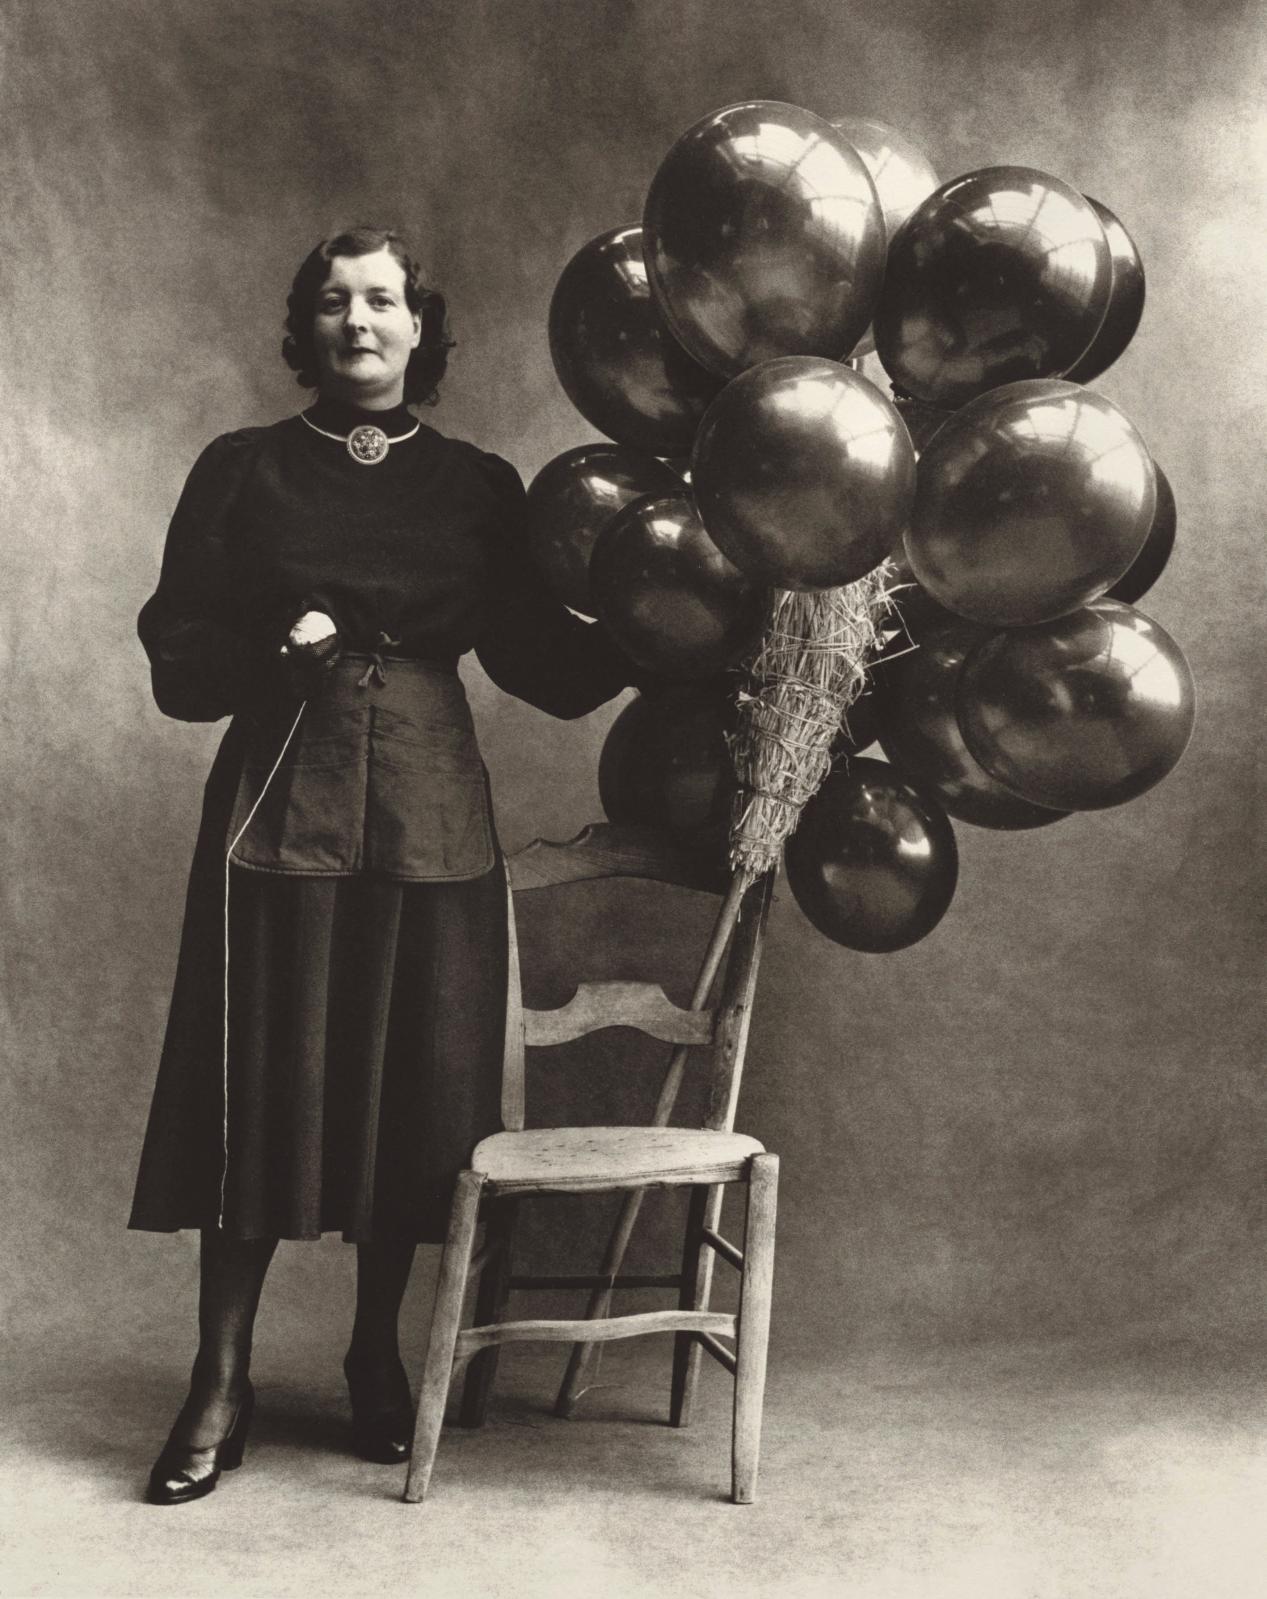 Irving Penn (1917-2009), Marchande de Ballons (B), Paris, 1950, platinum-palladium print, 1967.© Condé Nast - Partial gift of The Irving P